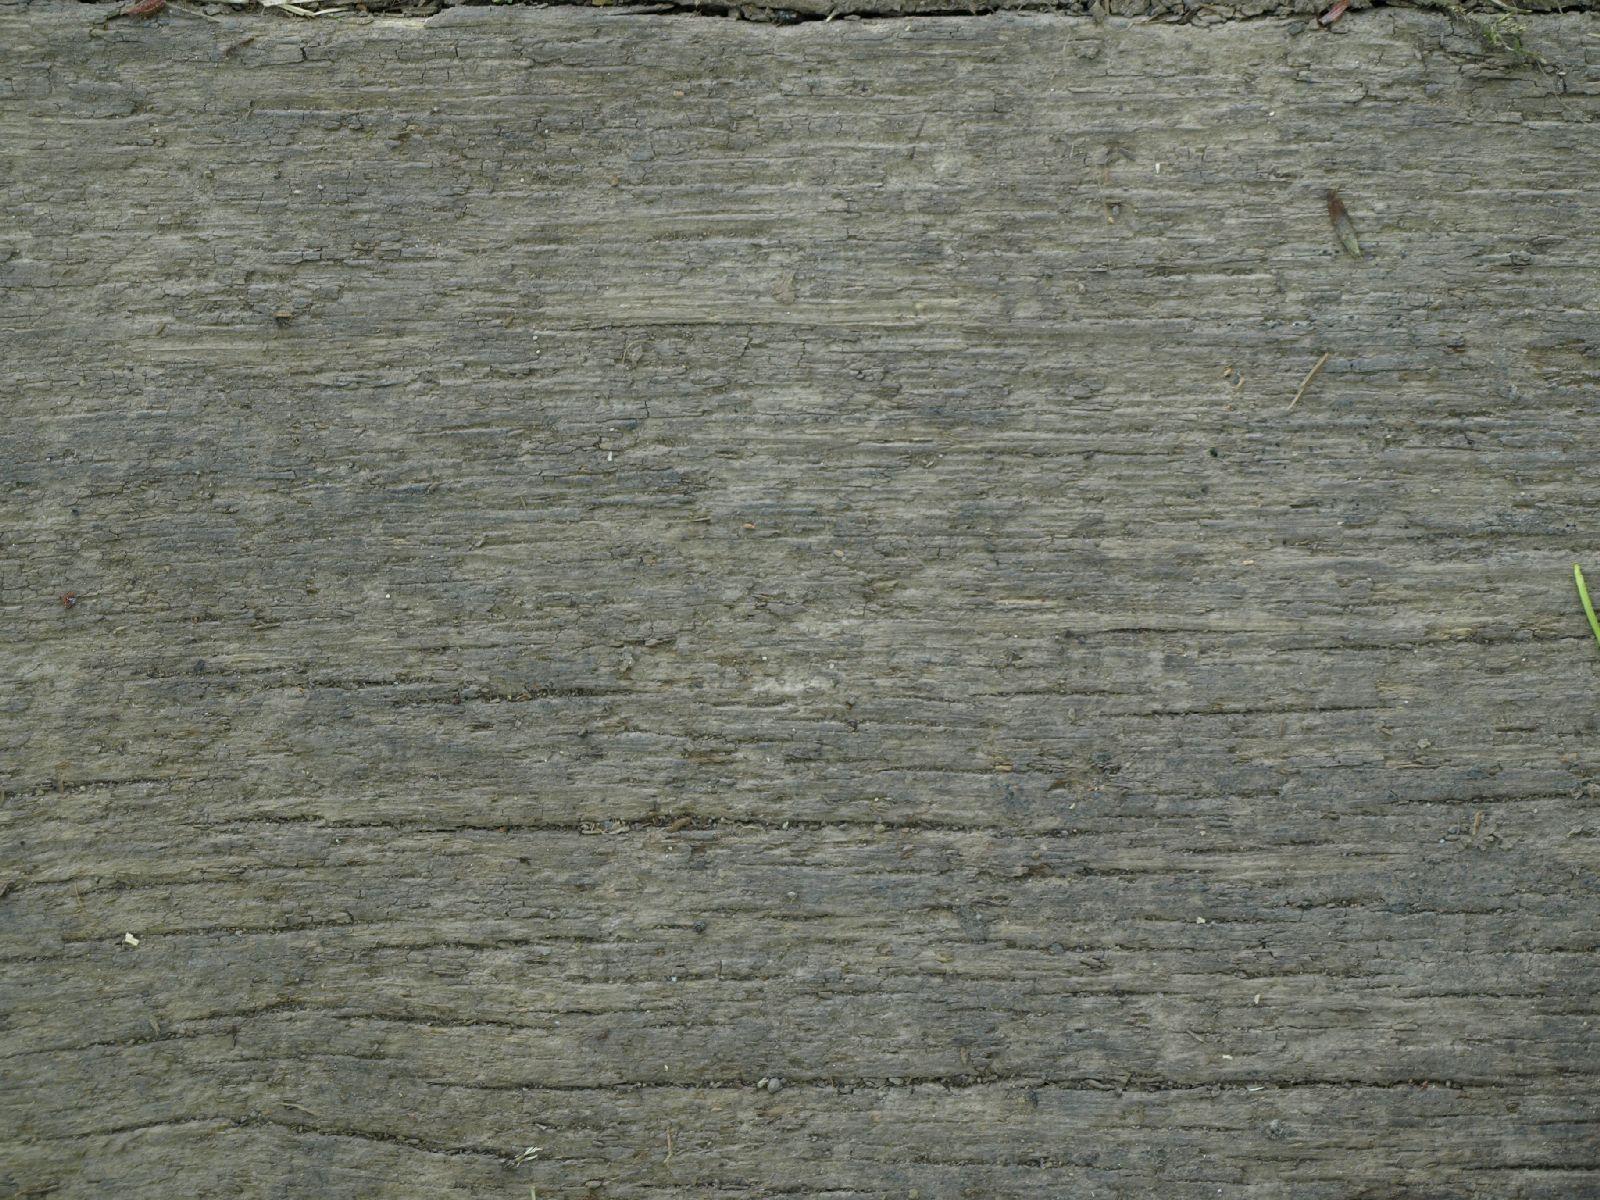 Wood_Texture_A_P5112638